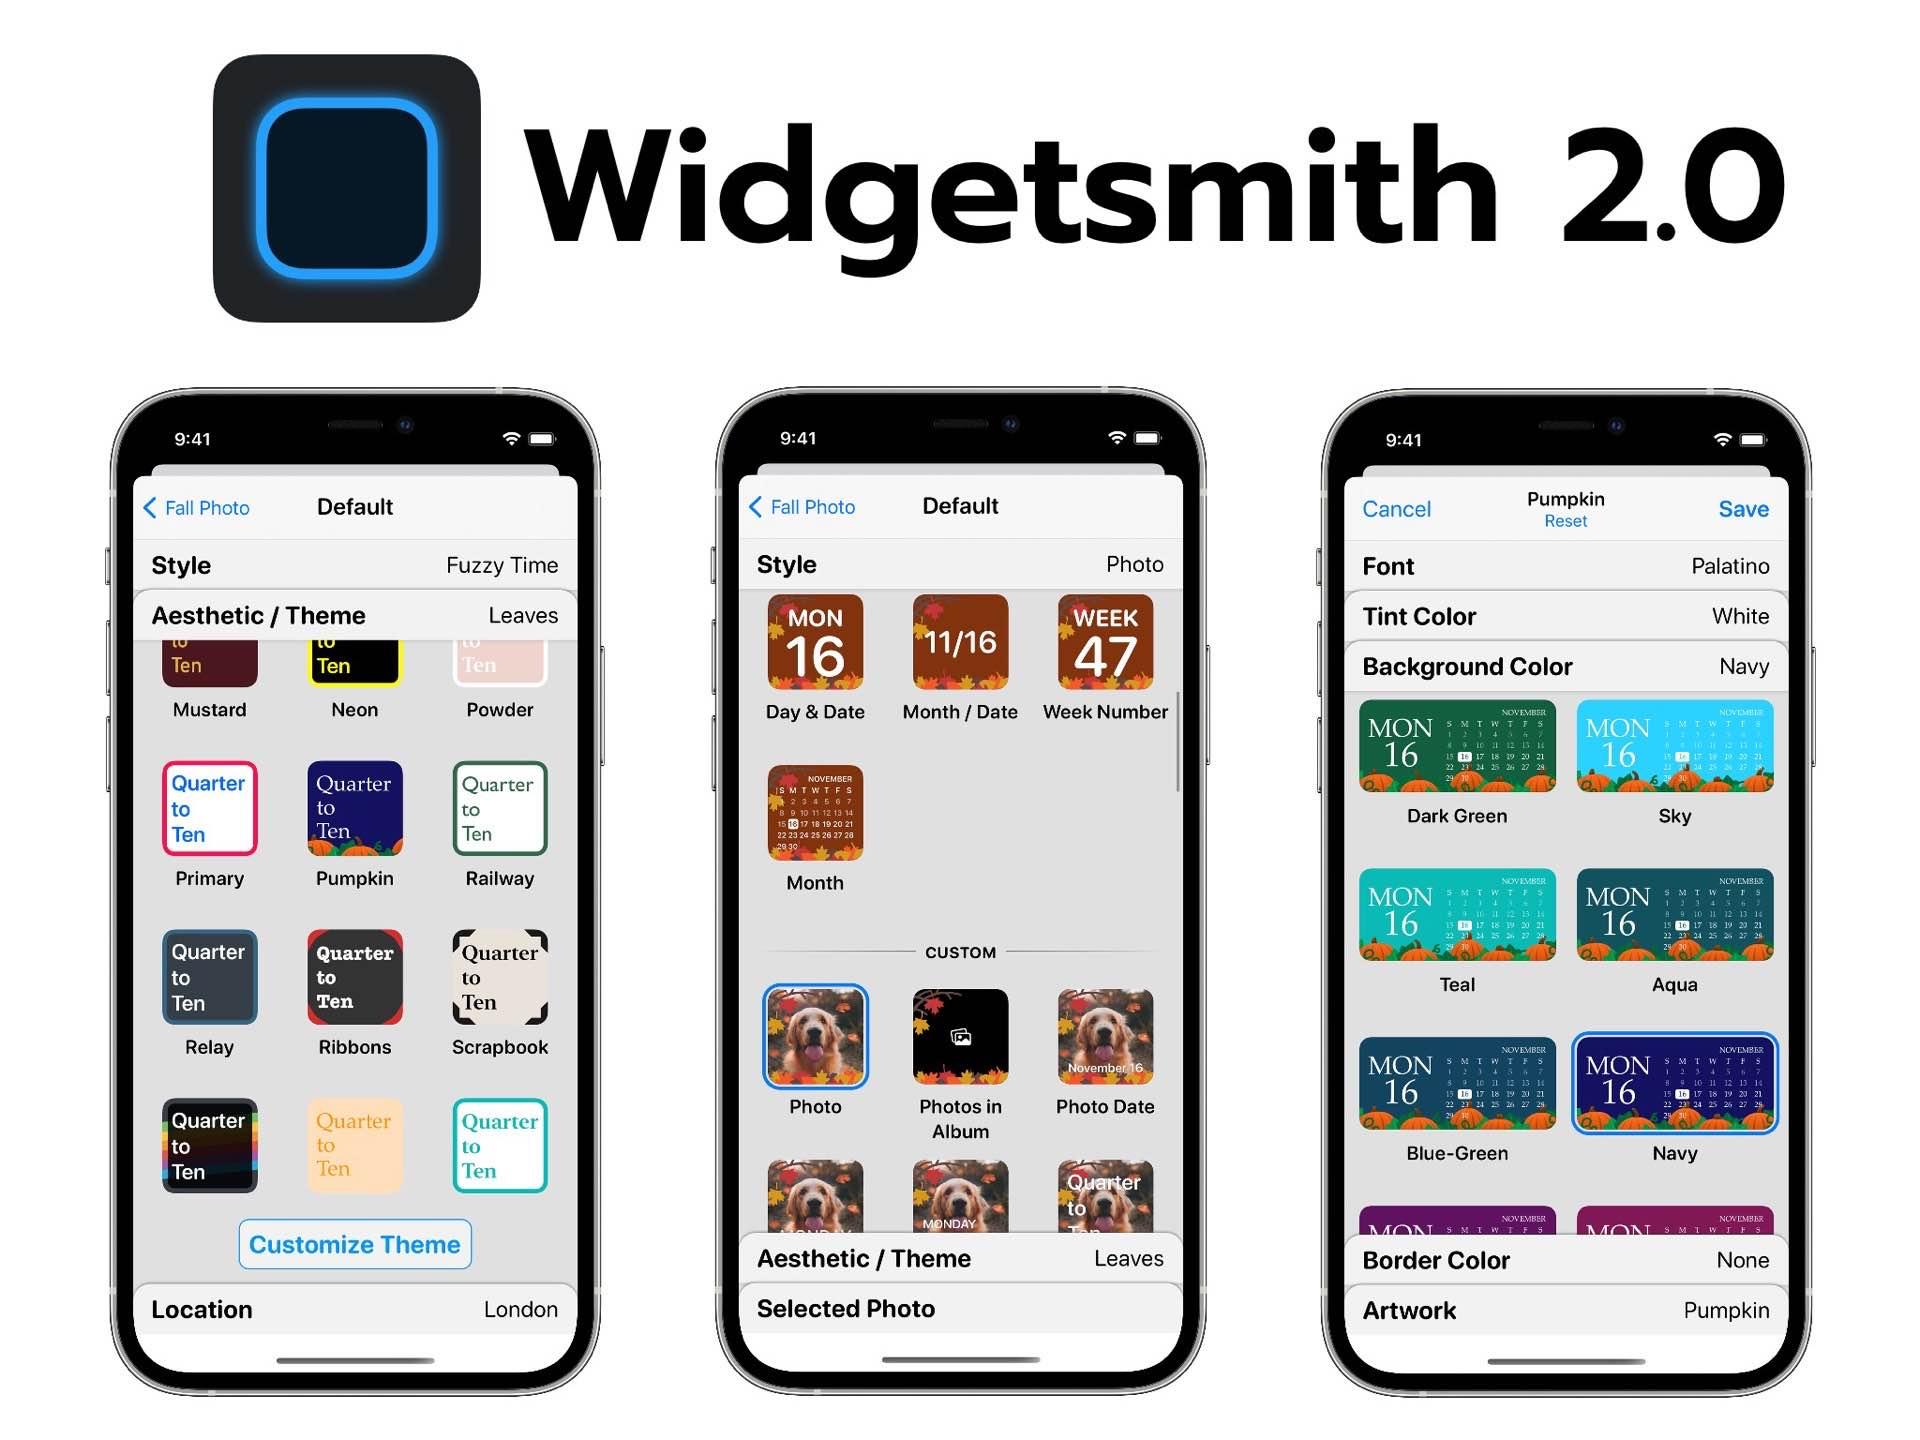 widgetsmith-2-0-for-ios